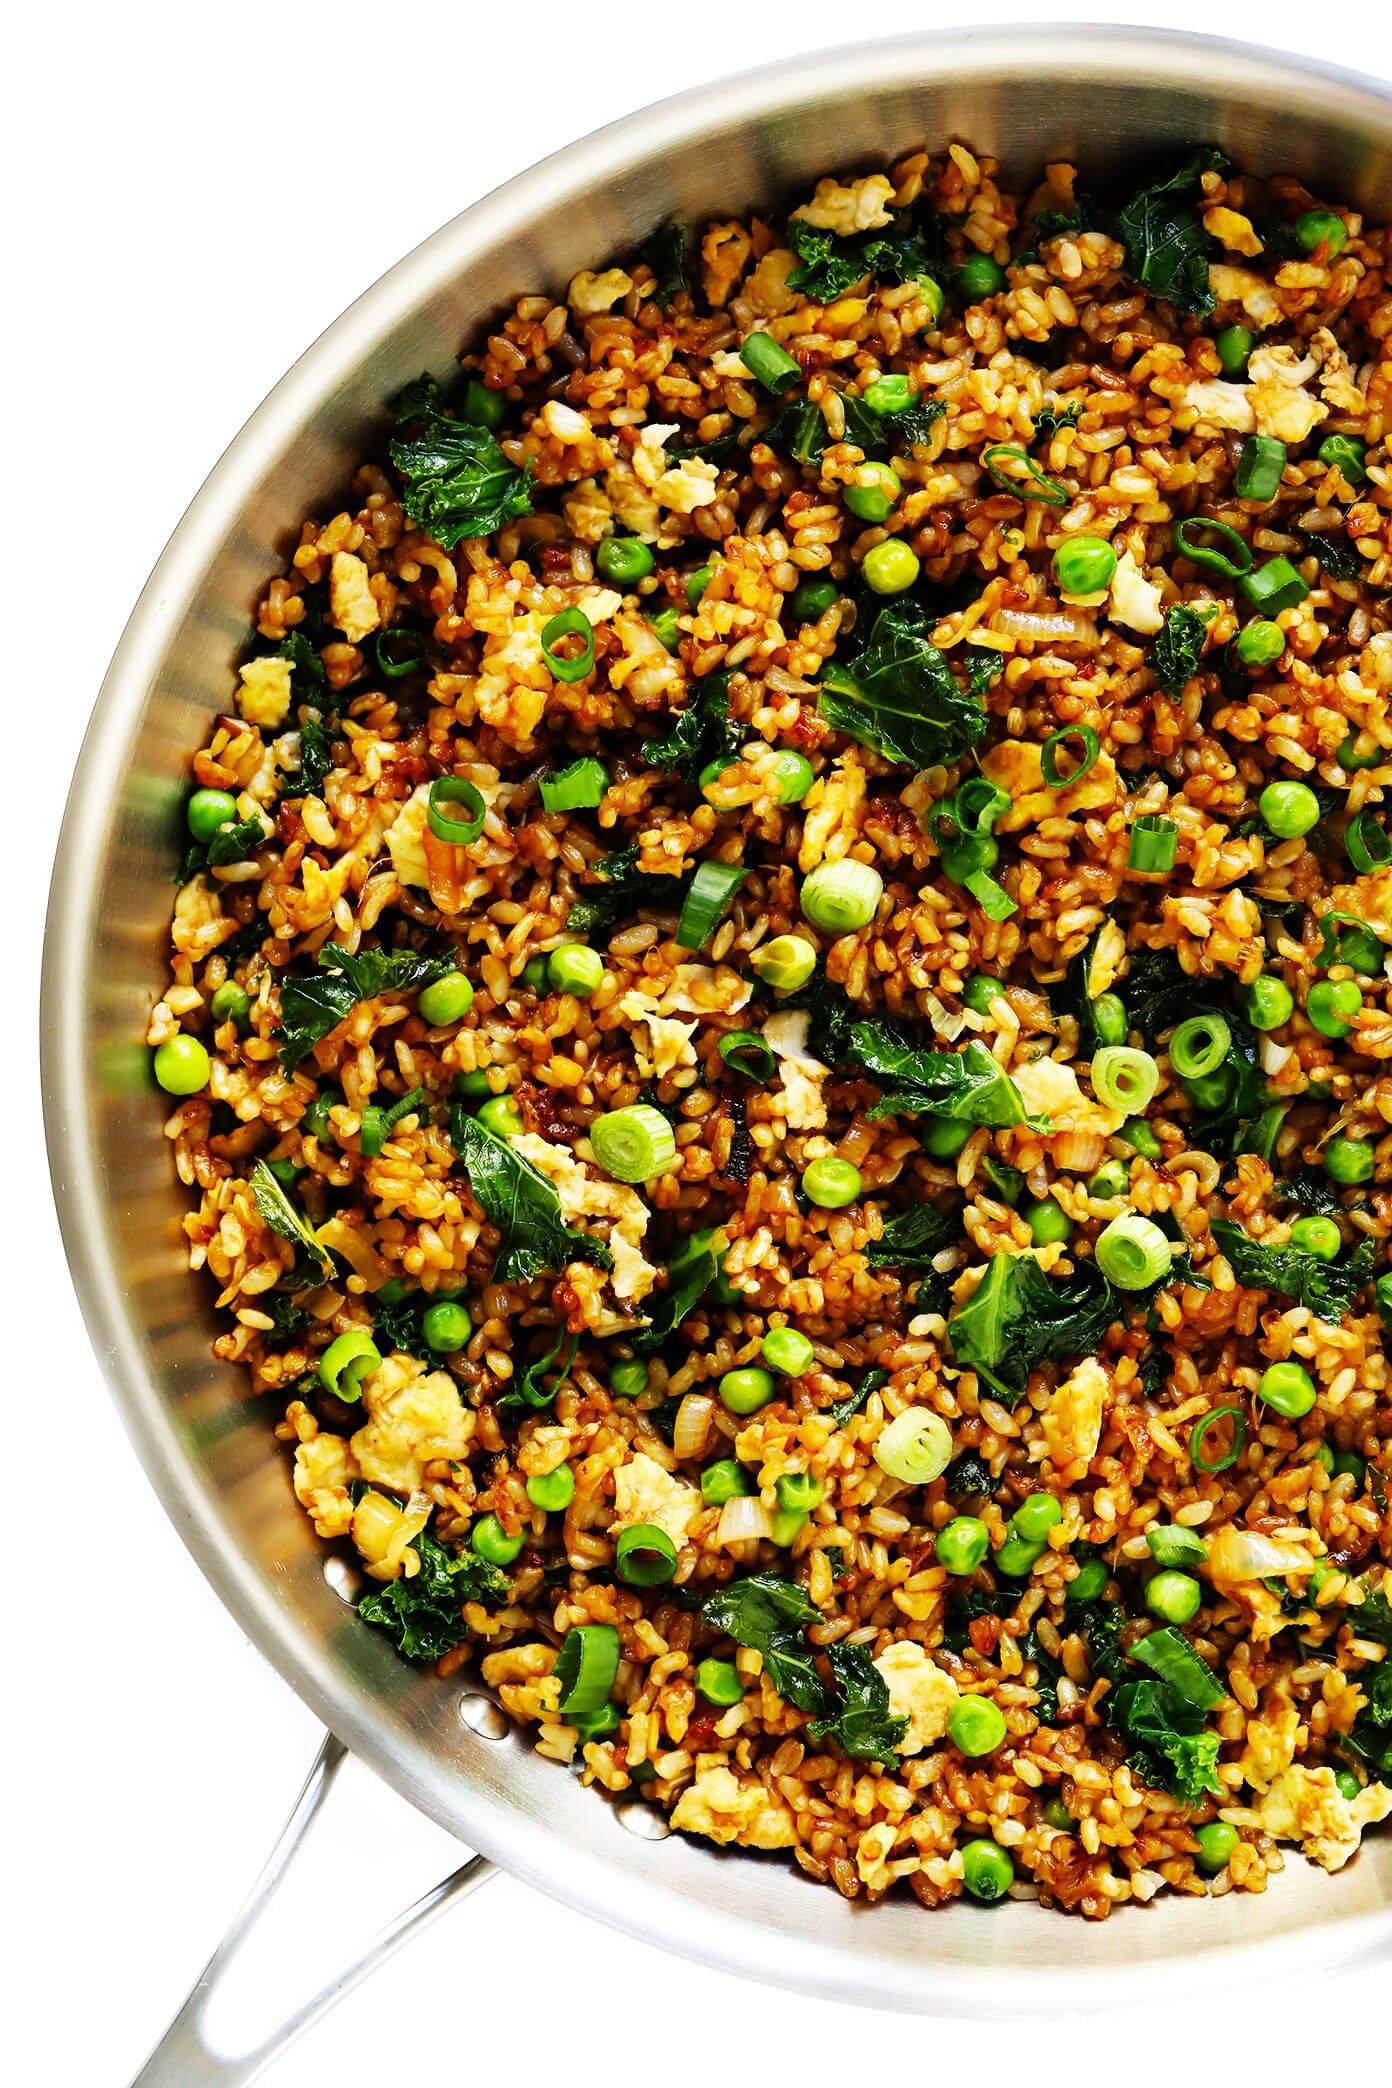 Ginger Kale Fried Brown Rice in Skillet